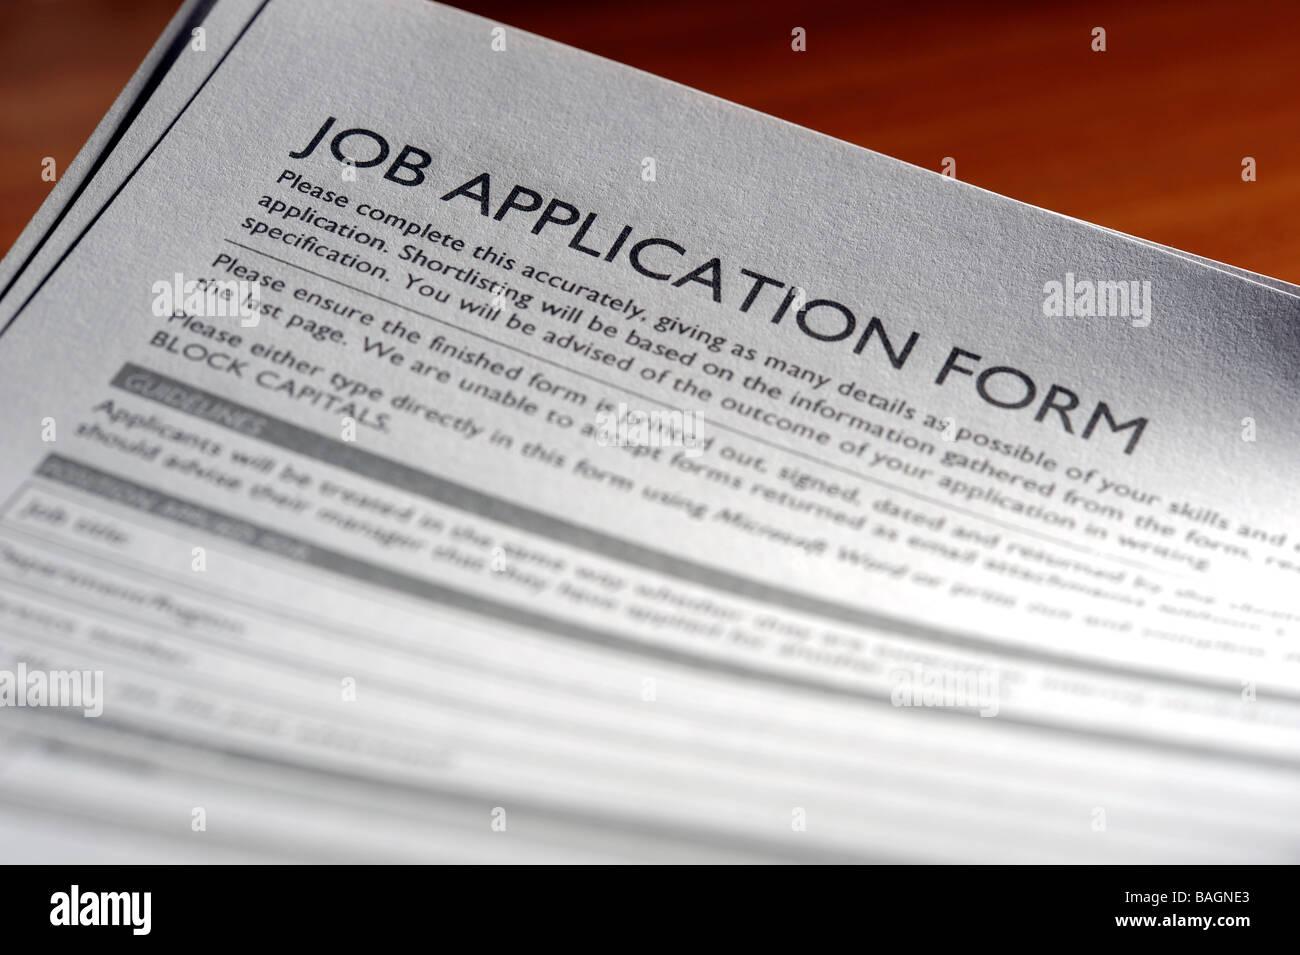 Job application form - Stock Image